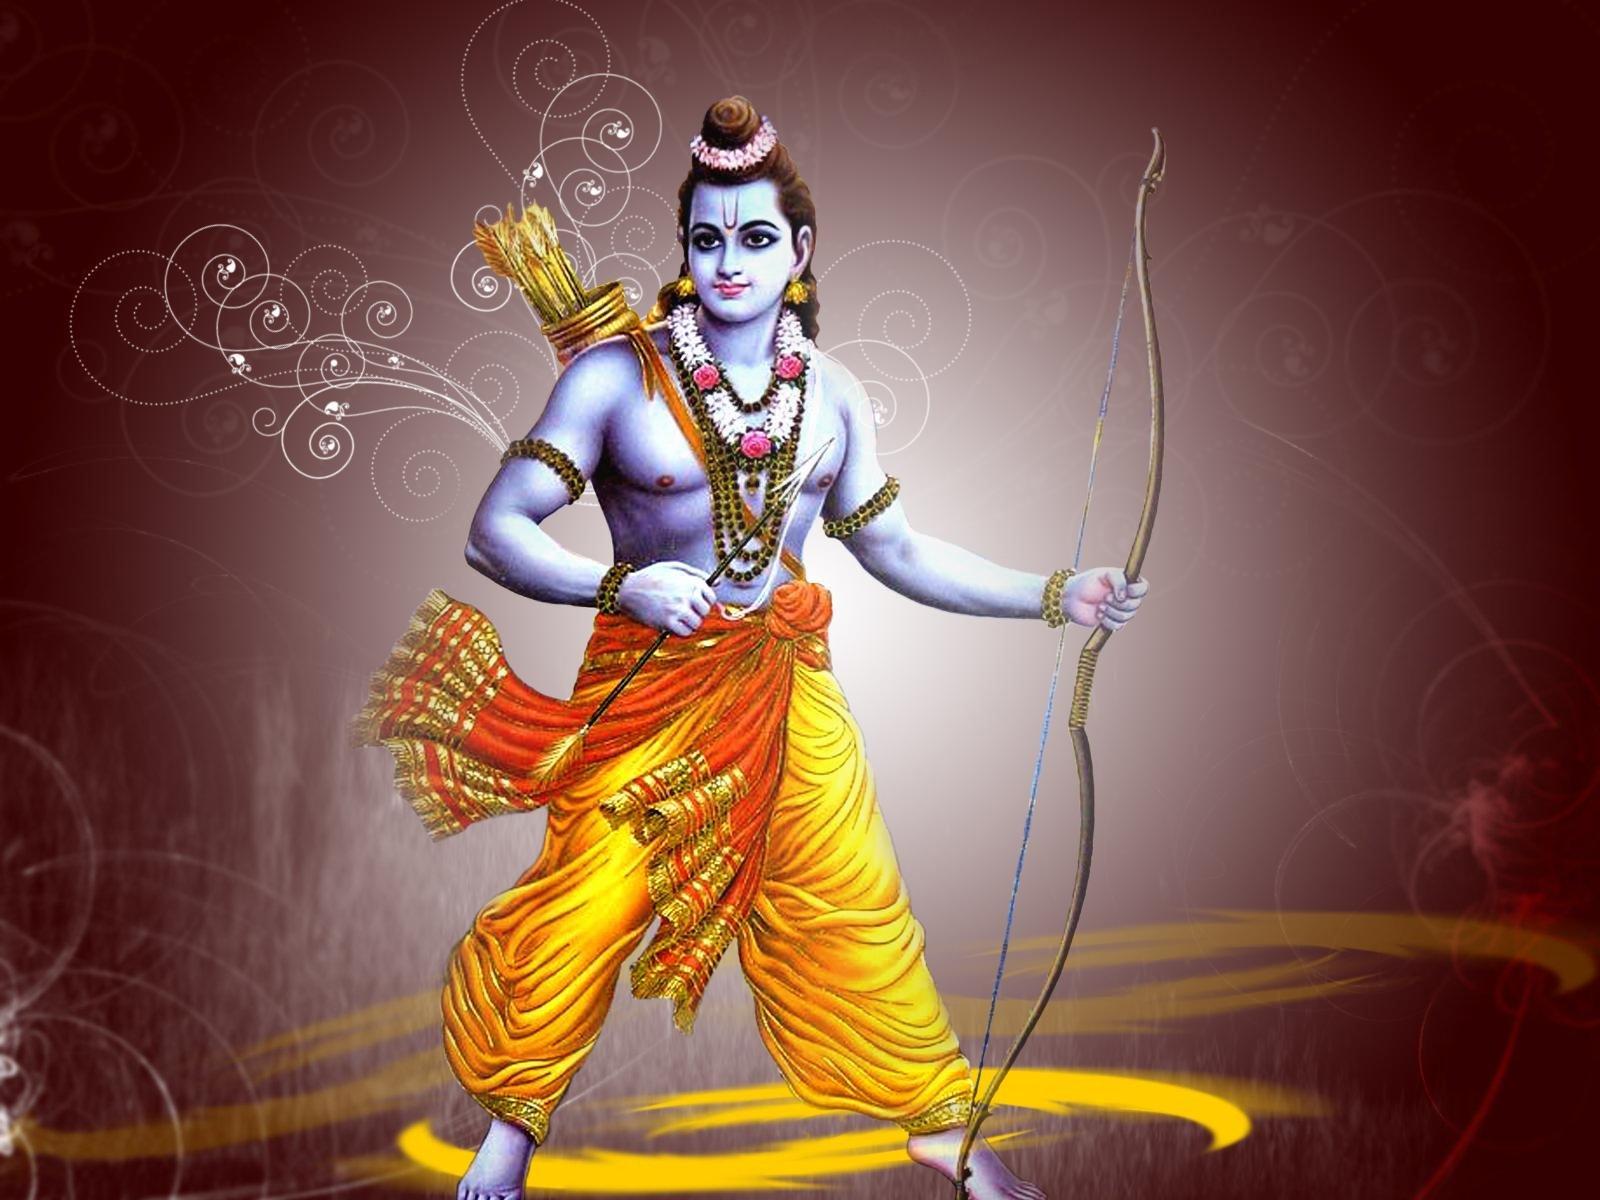 hindu god shri ram wallpapers hindu god shri ram wallpapers hindu god 1600x1200